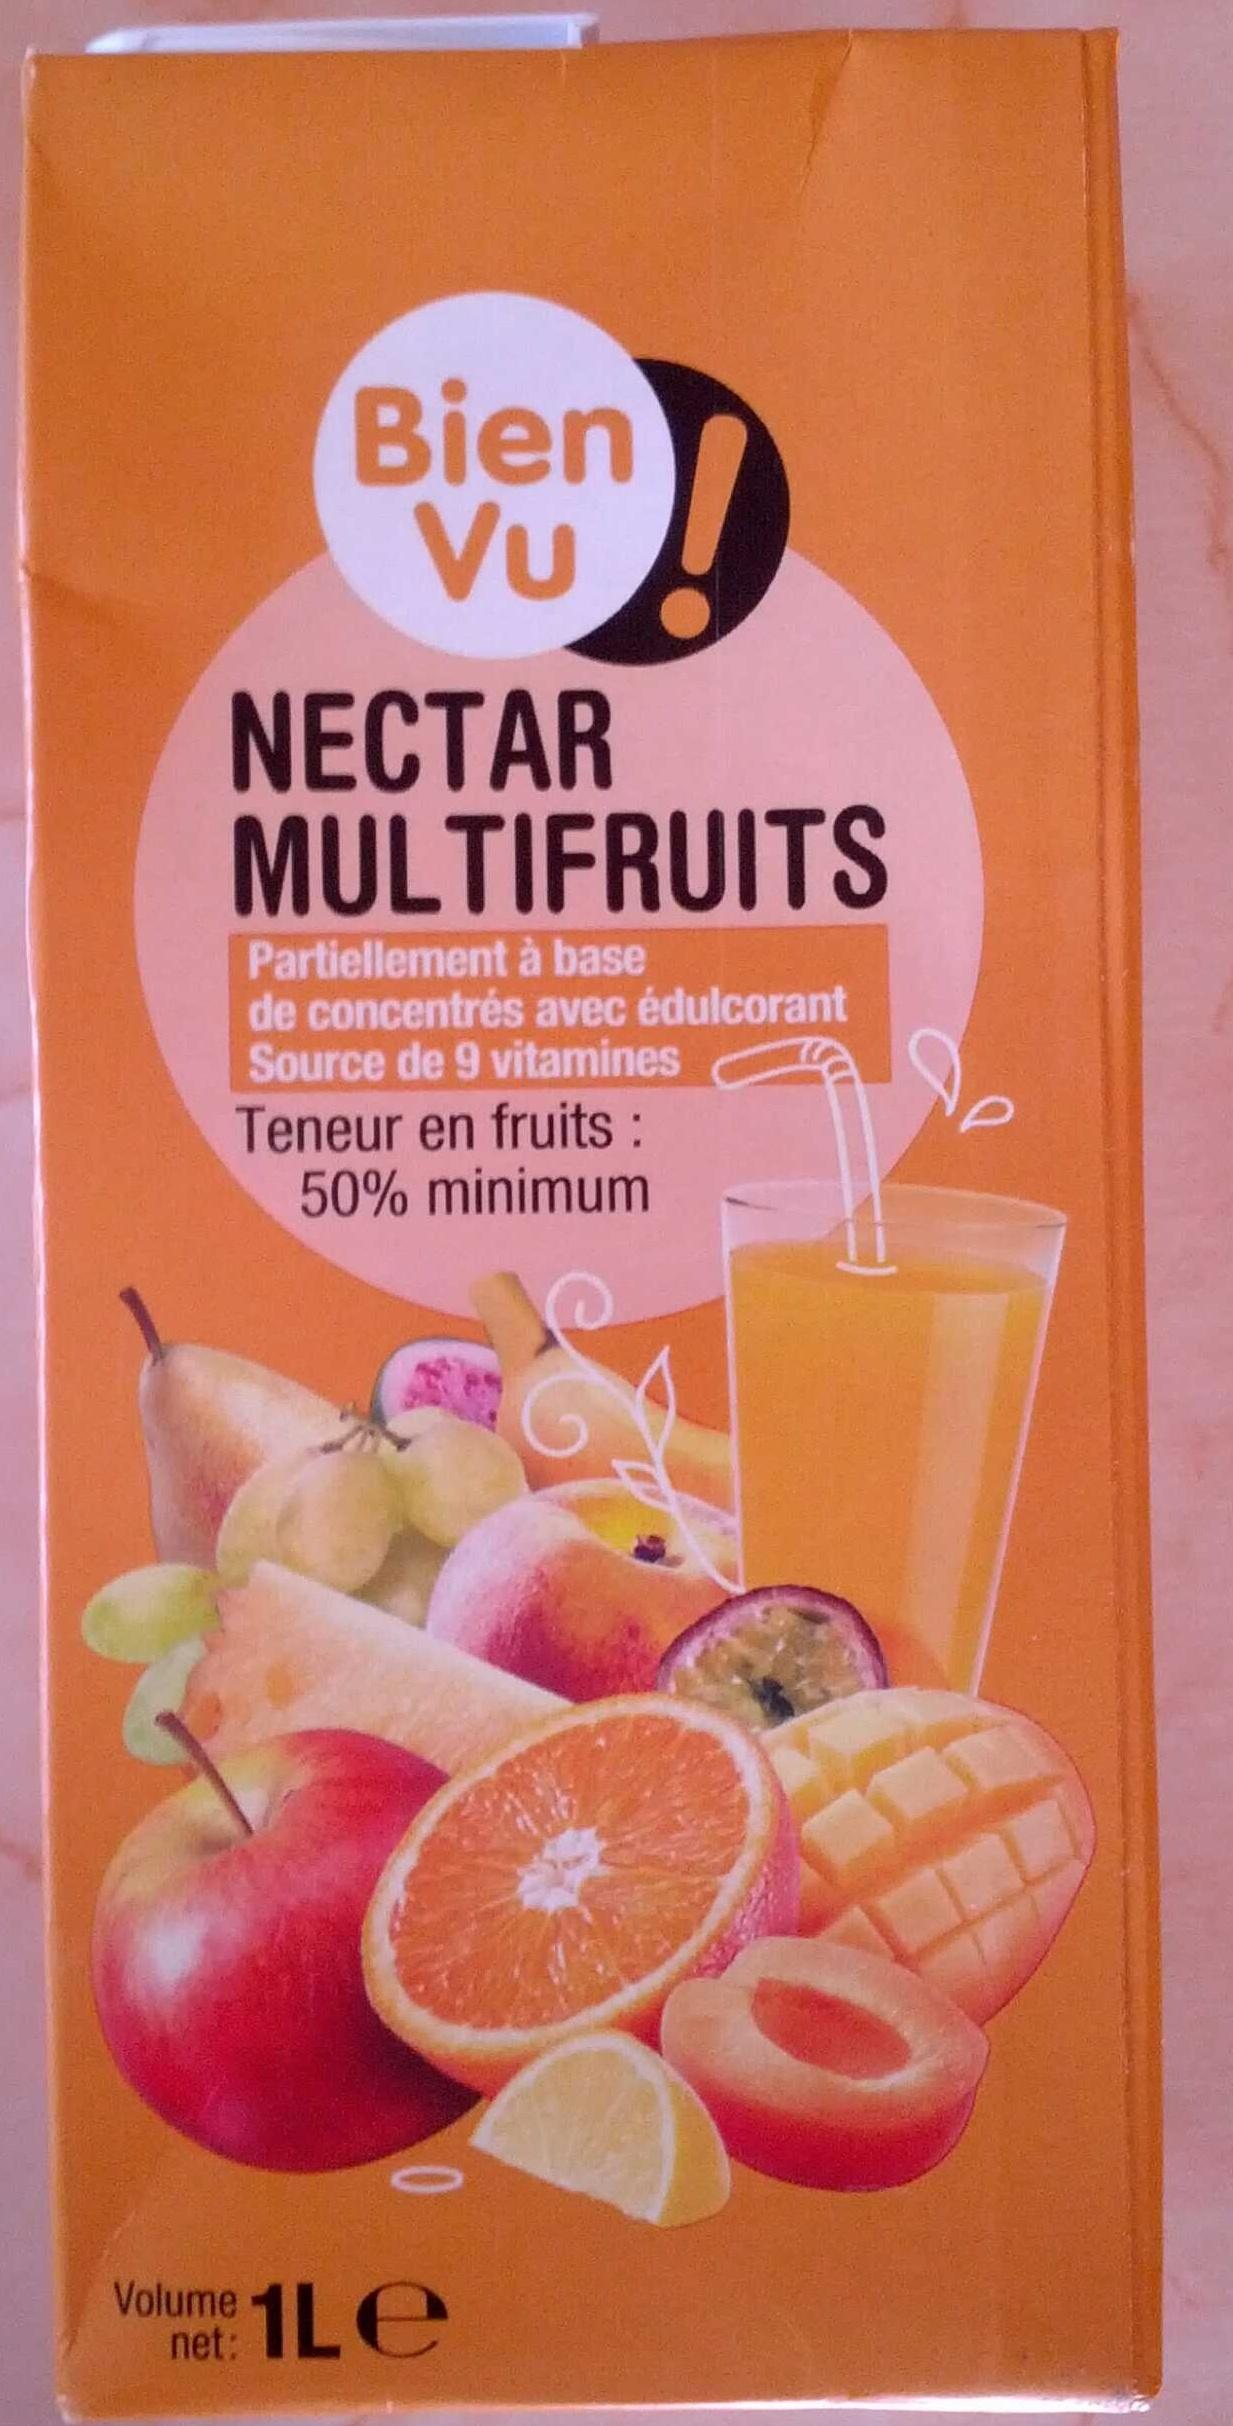 Nectar multifruits - Produit - fr